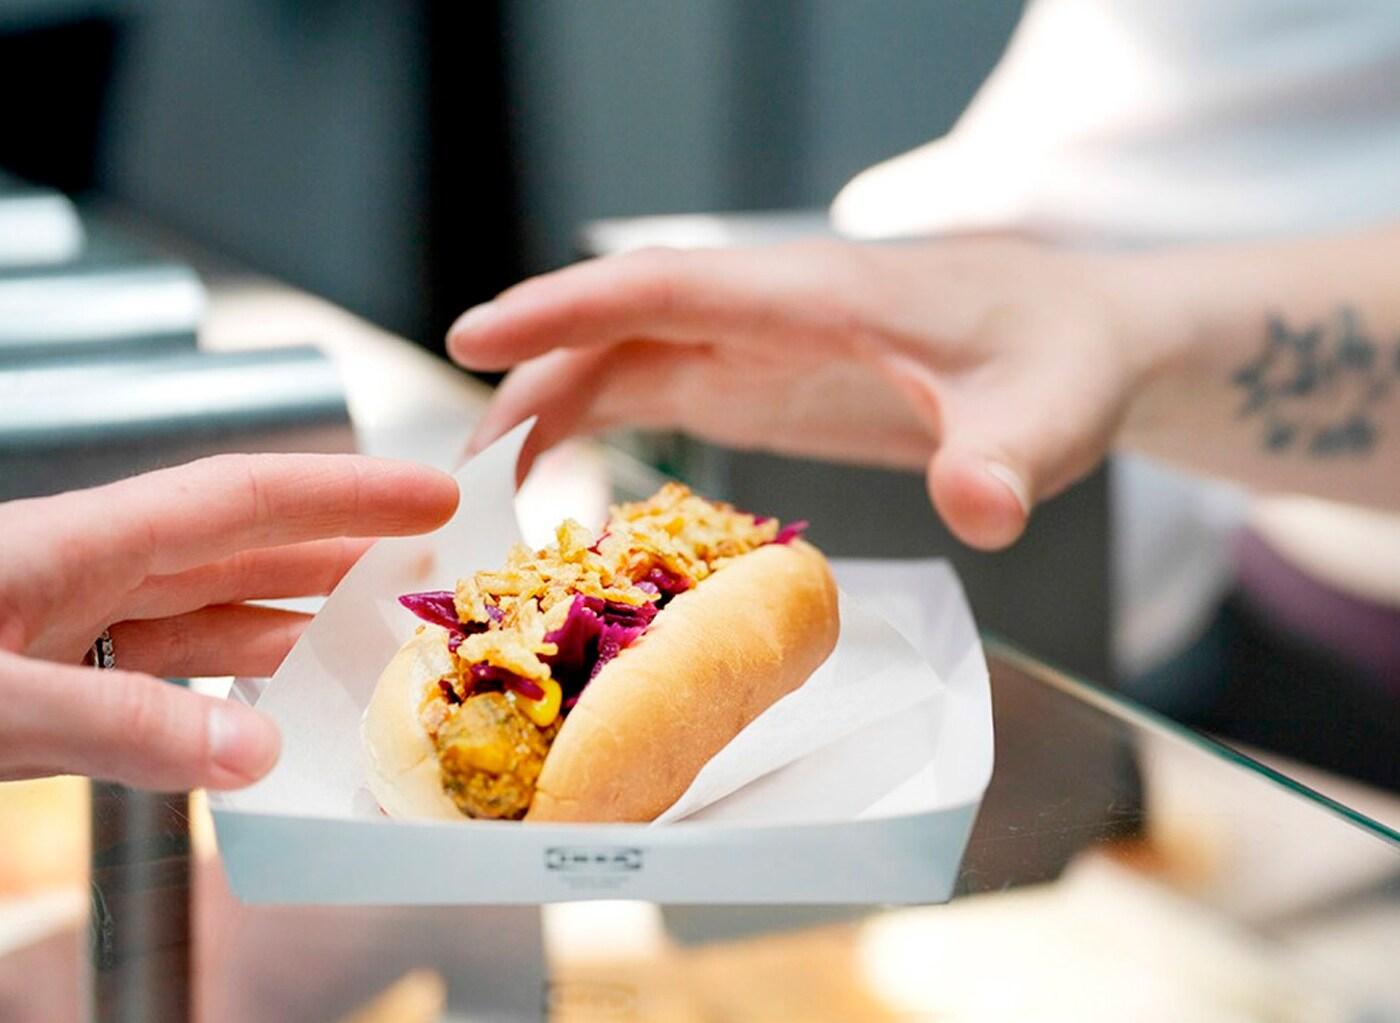 Hot dog vegetariano ikea for Cucinare hot dog